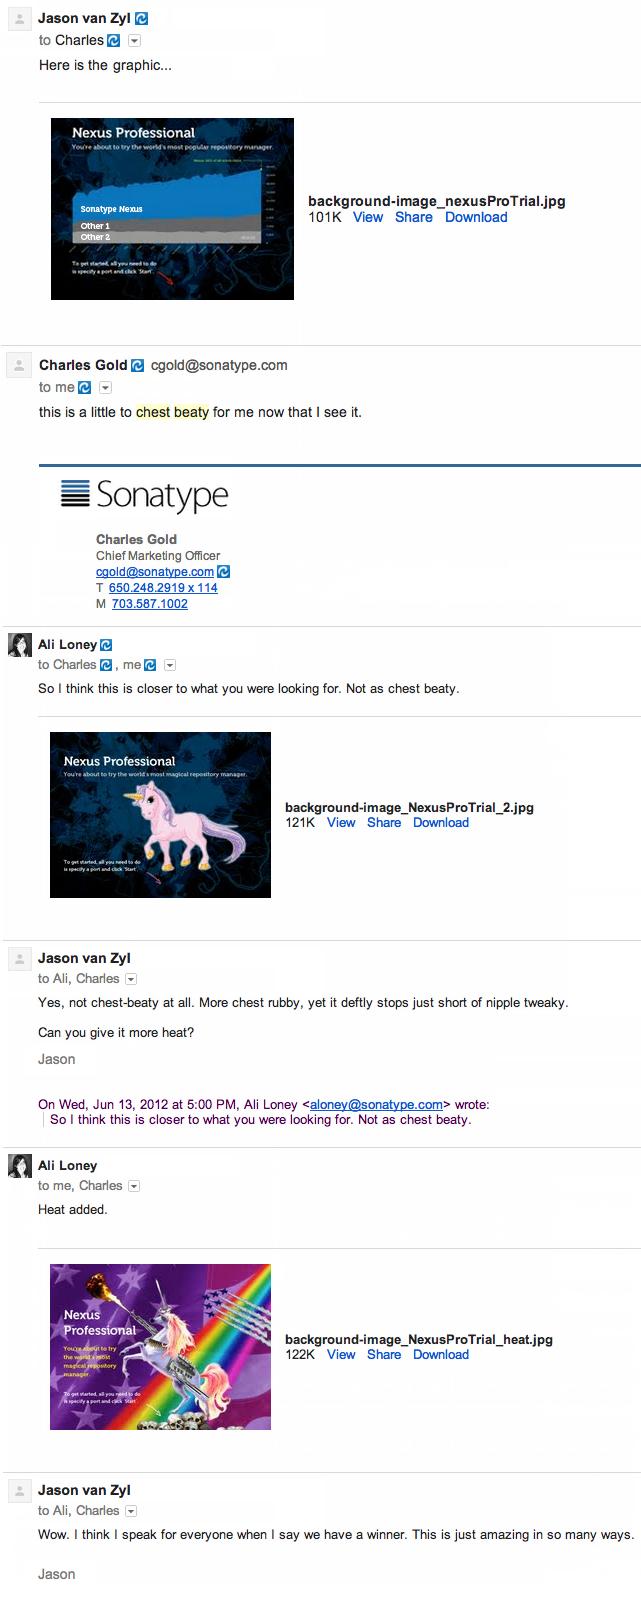 Nexus Splash Screen Email Thread